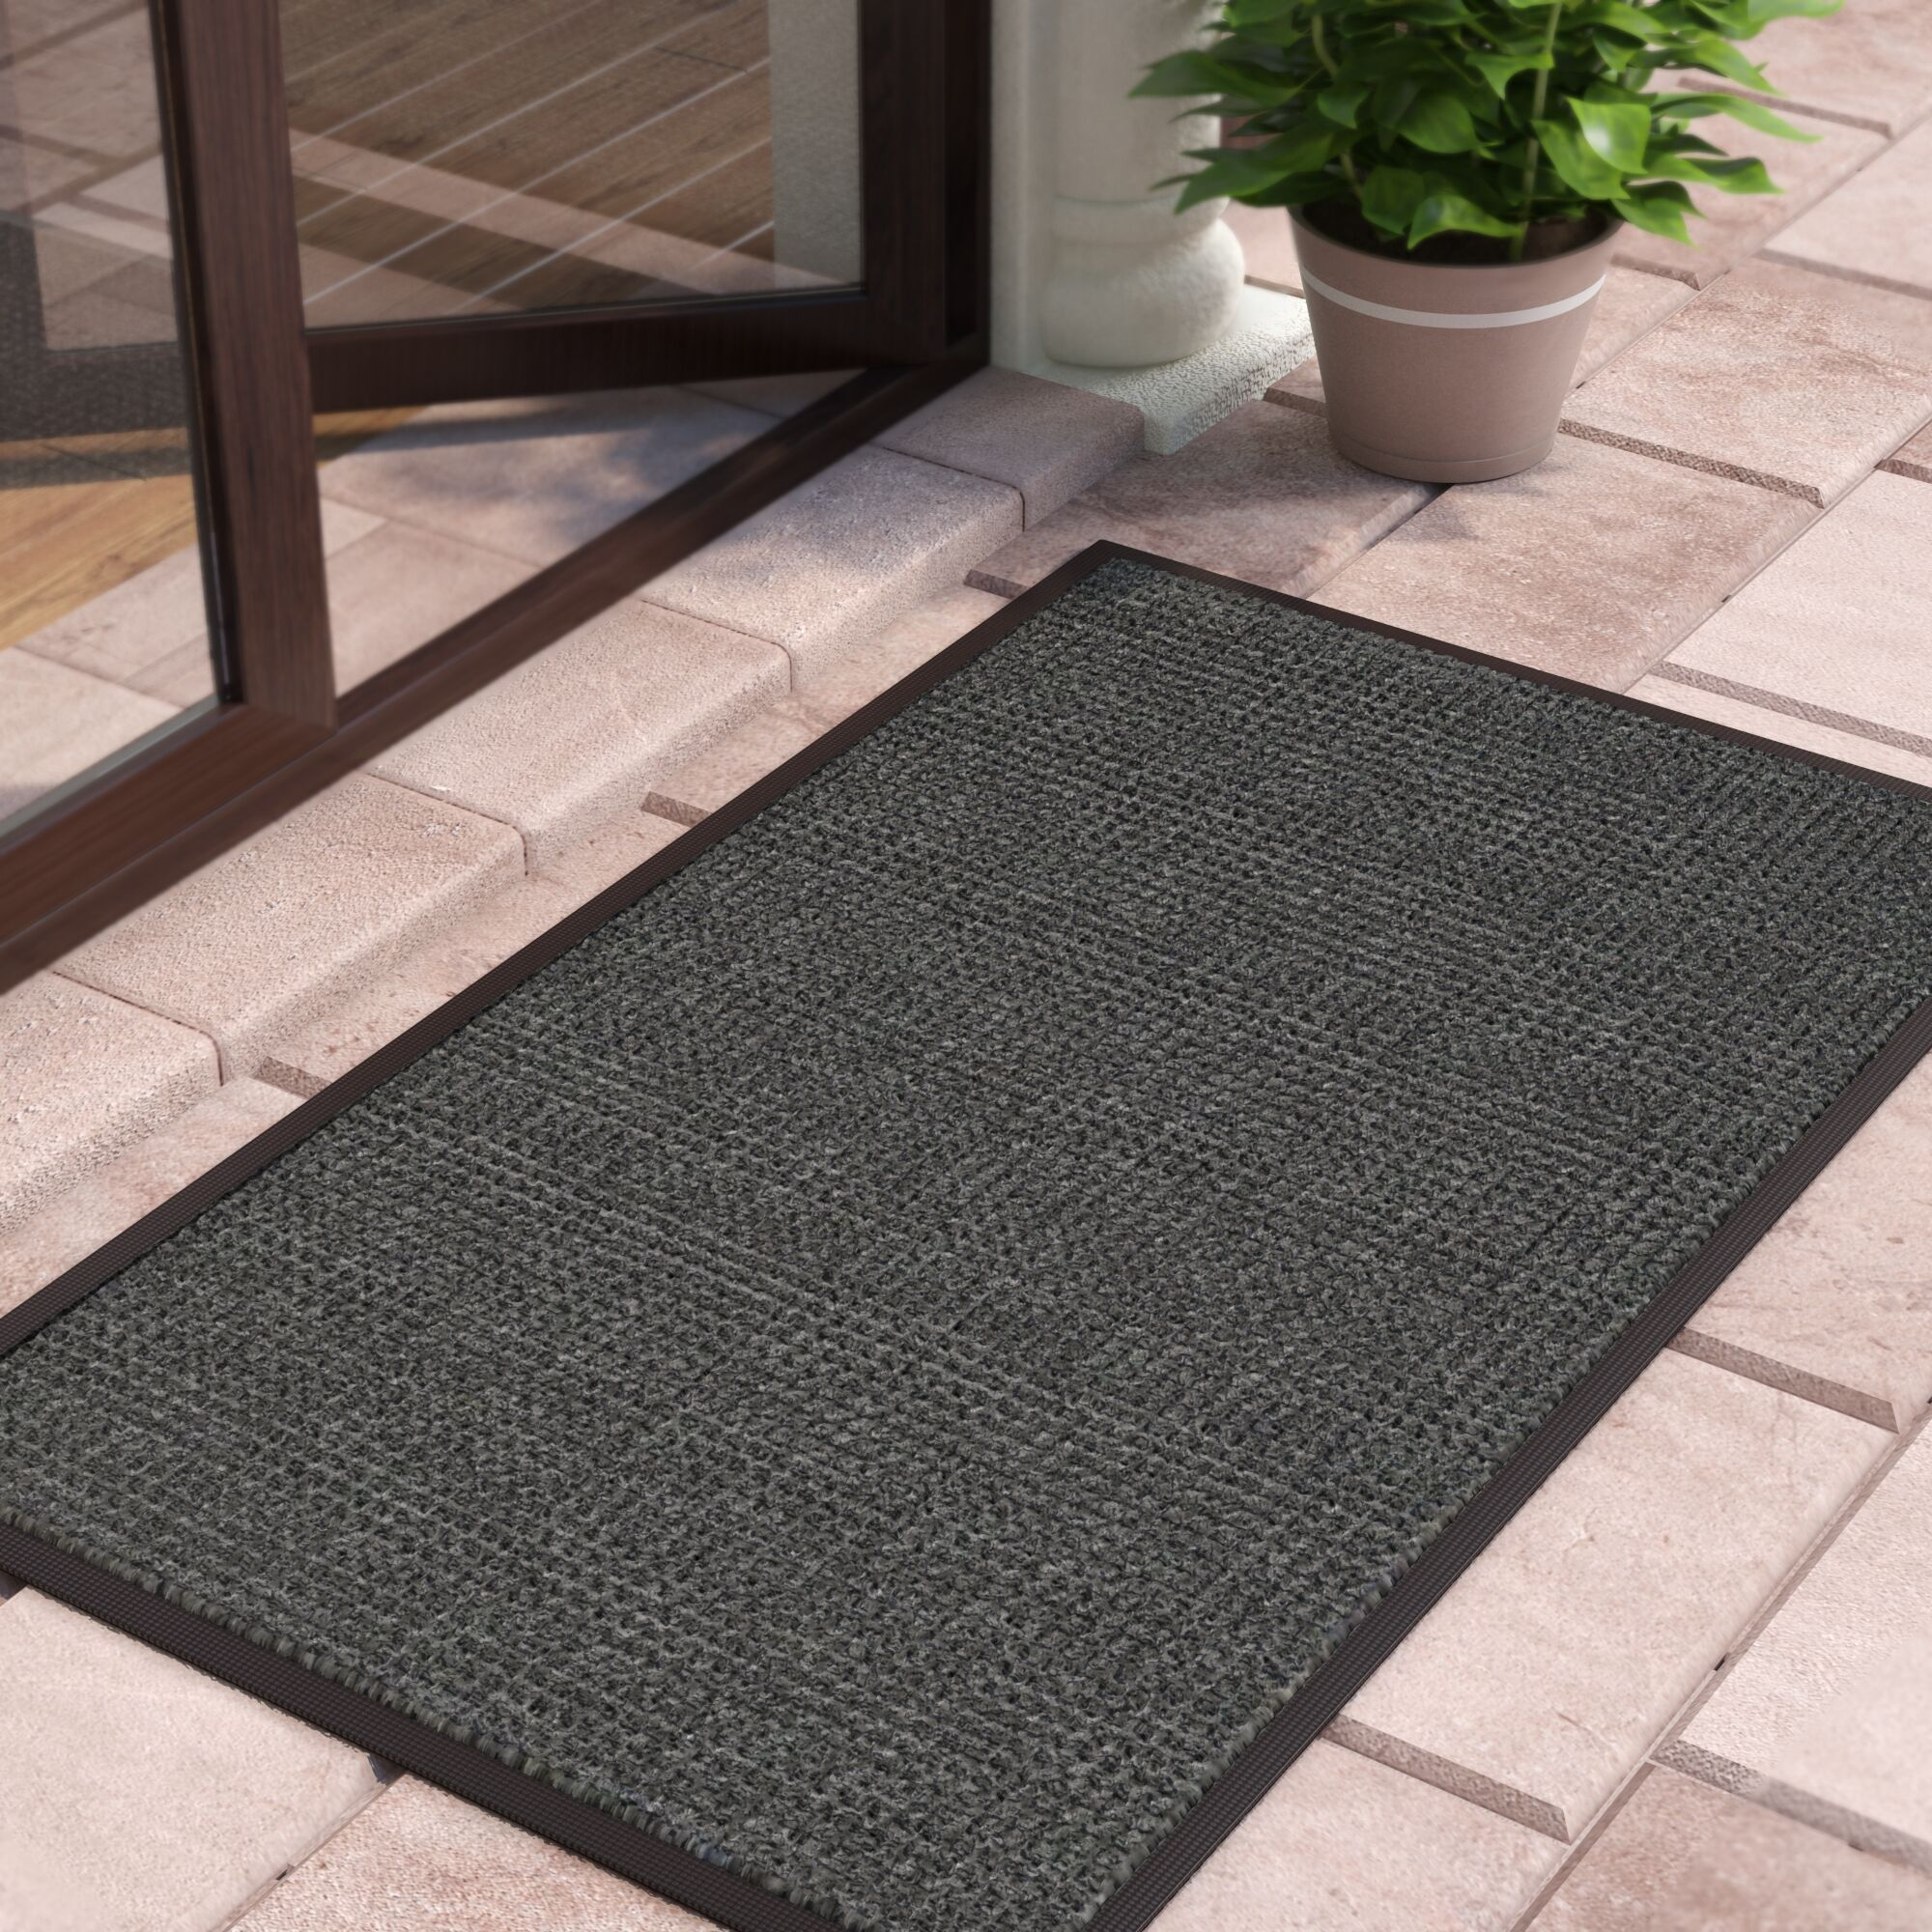 Solid Doormat Mat Size: Rectangle 3'x10', Color: Charcoal